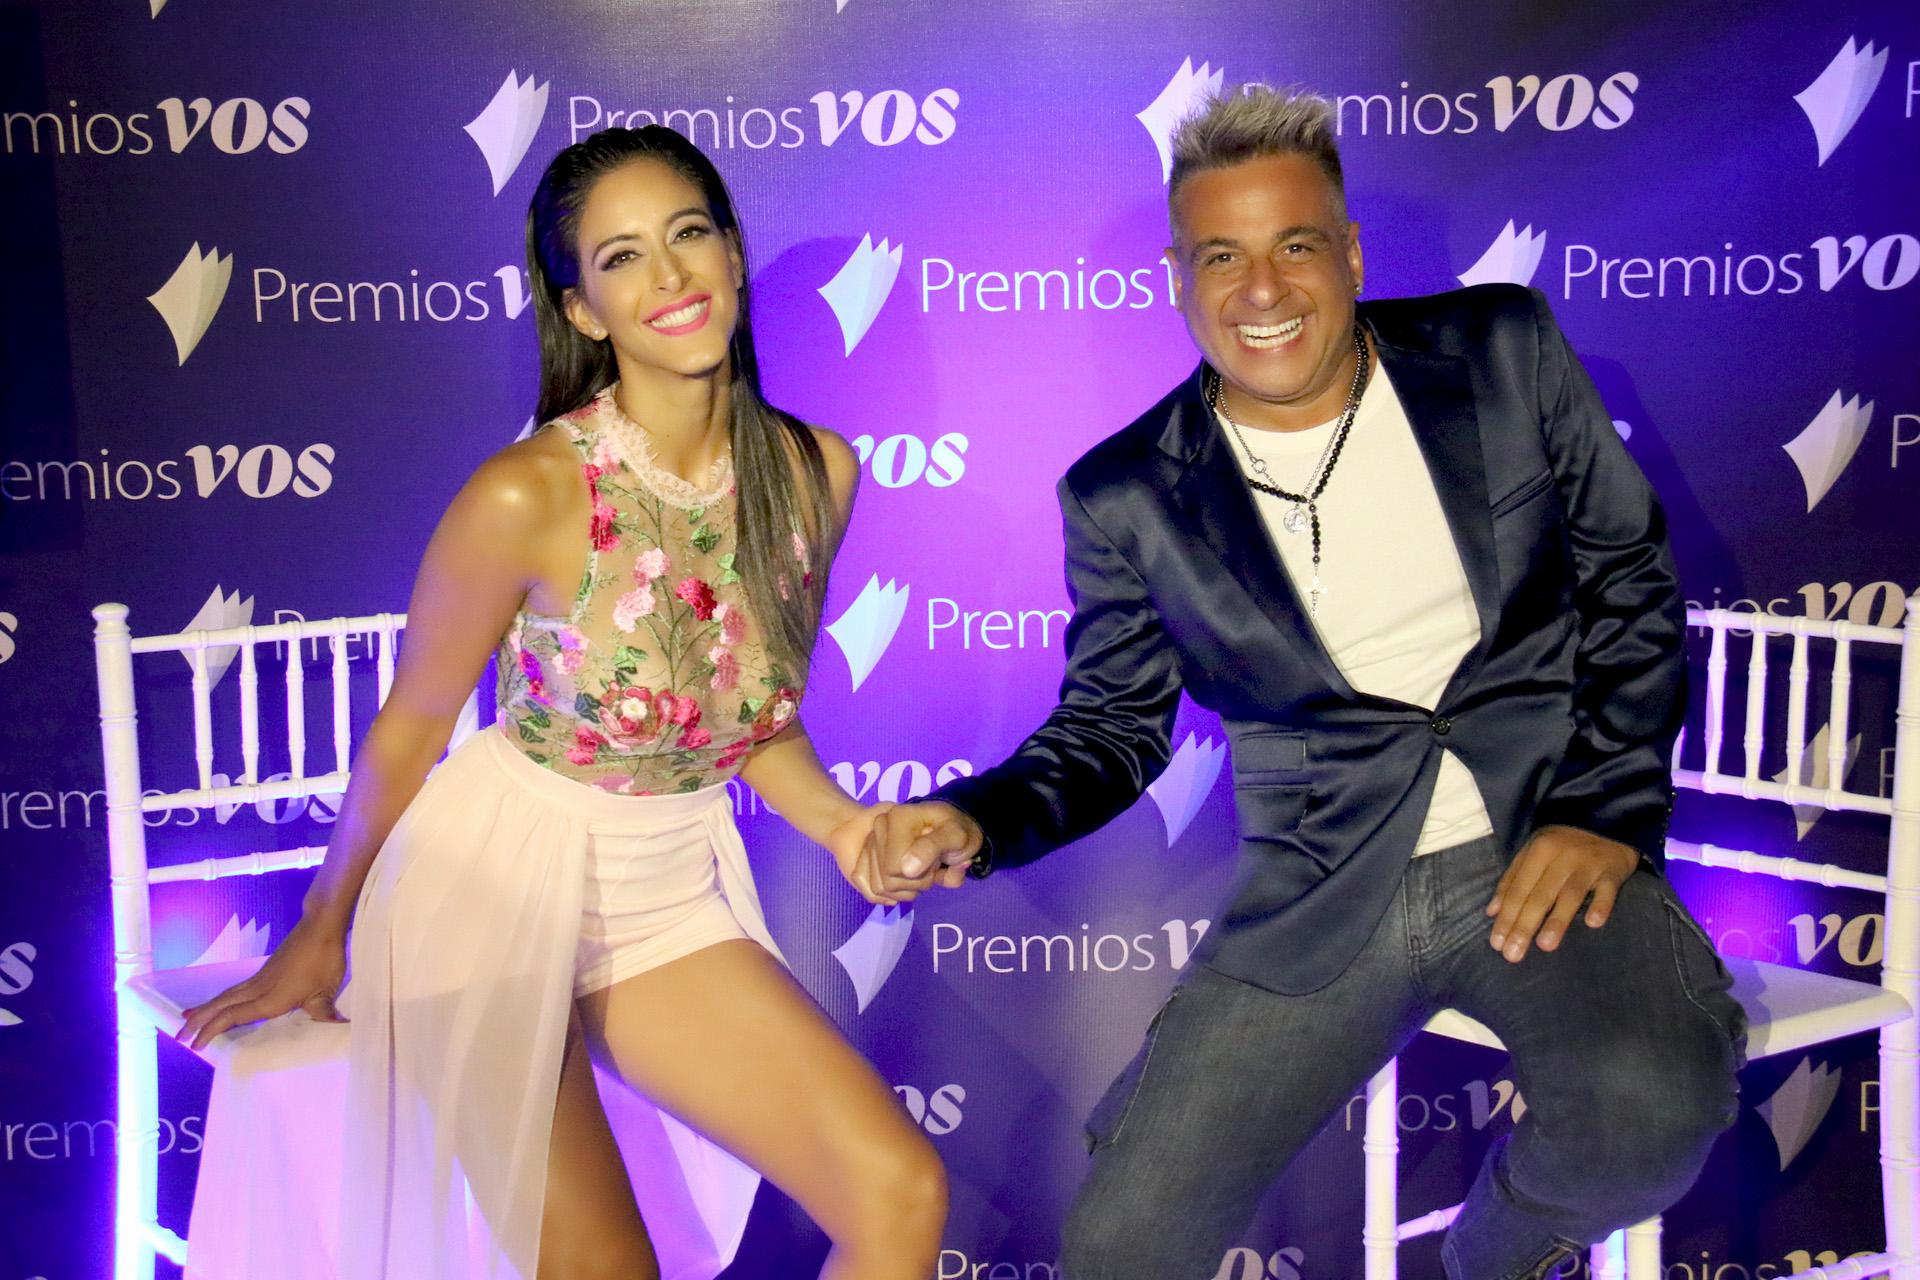 Celeste Muriega y Marcelo Iripino